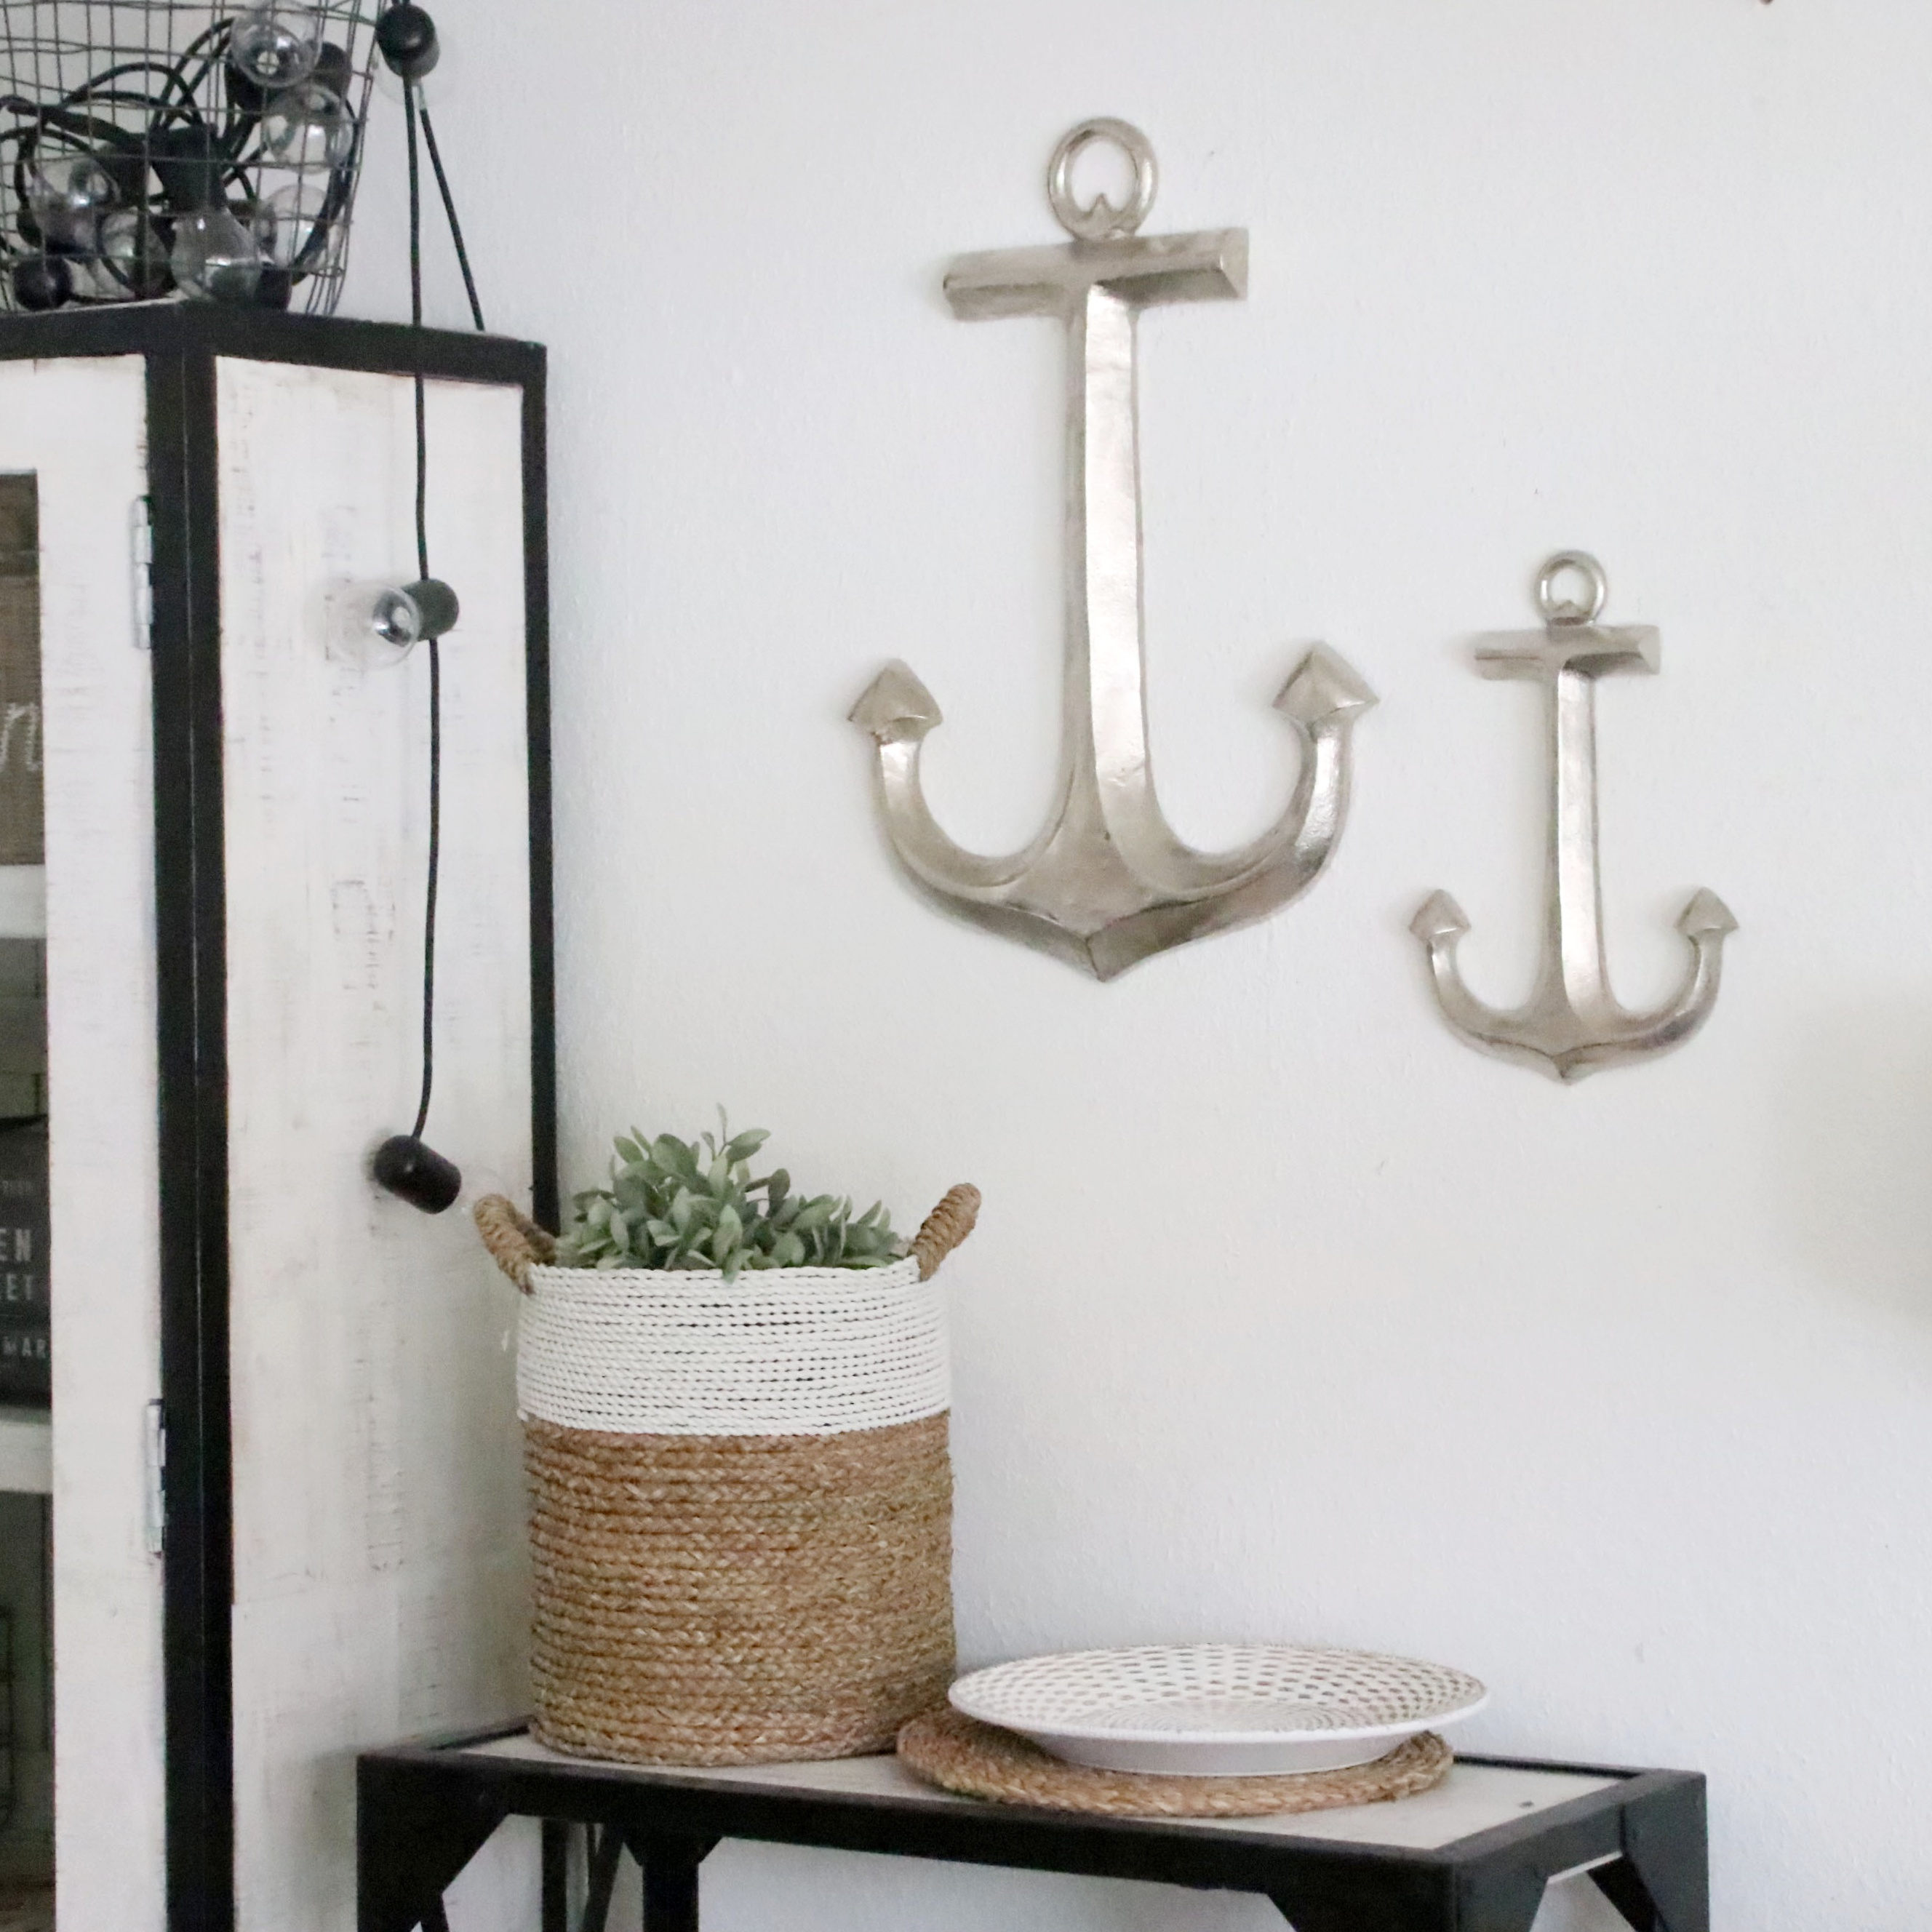 wandobjekt anker aluminium 2 gr en deko wohnen und dekorieren seaside64 deko. Black Bedroom Furniture Sets. Home Design Ideas